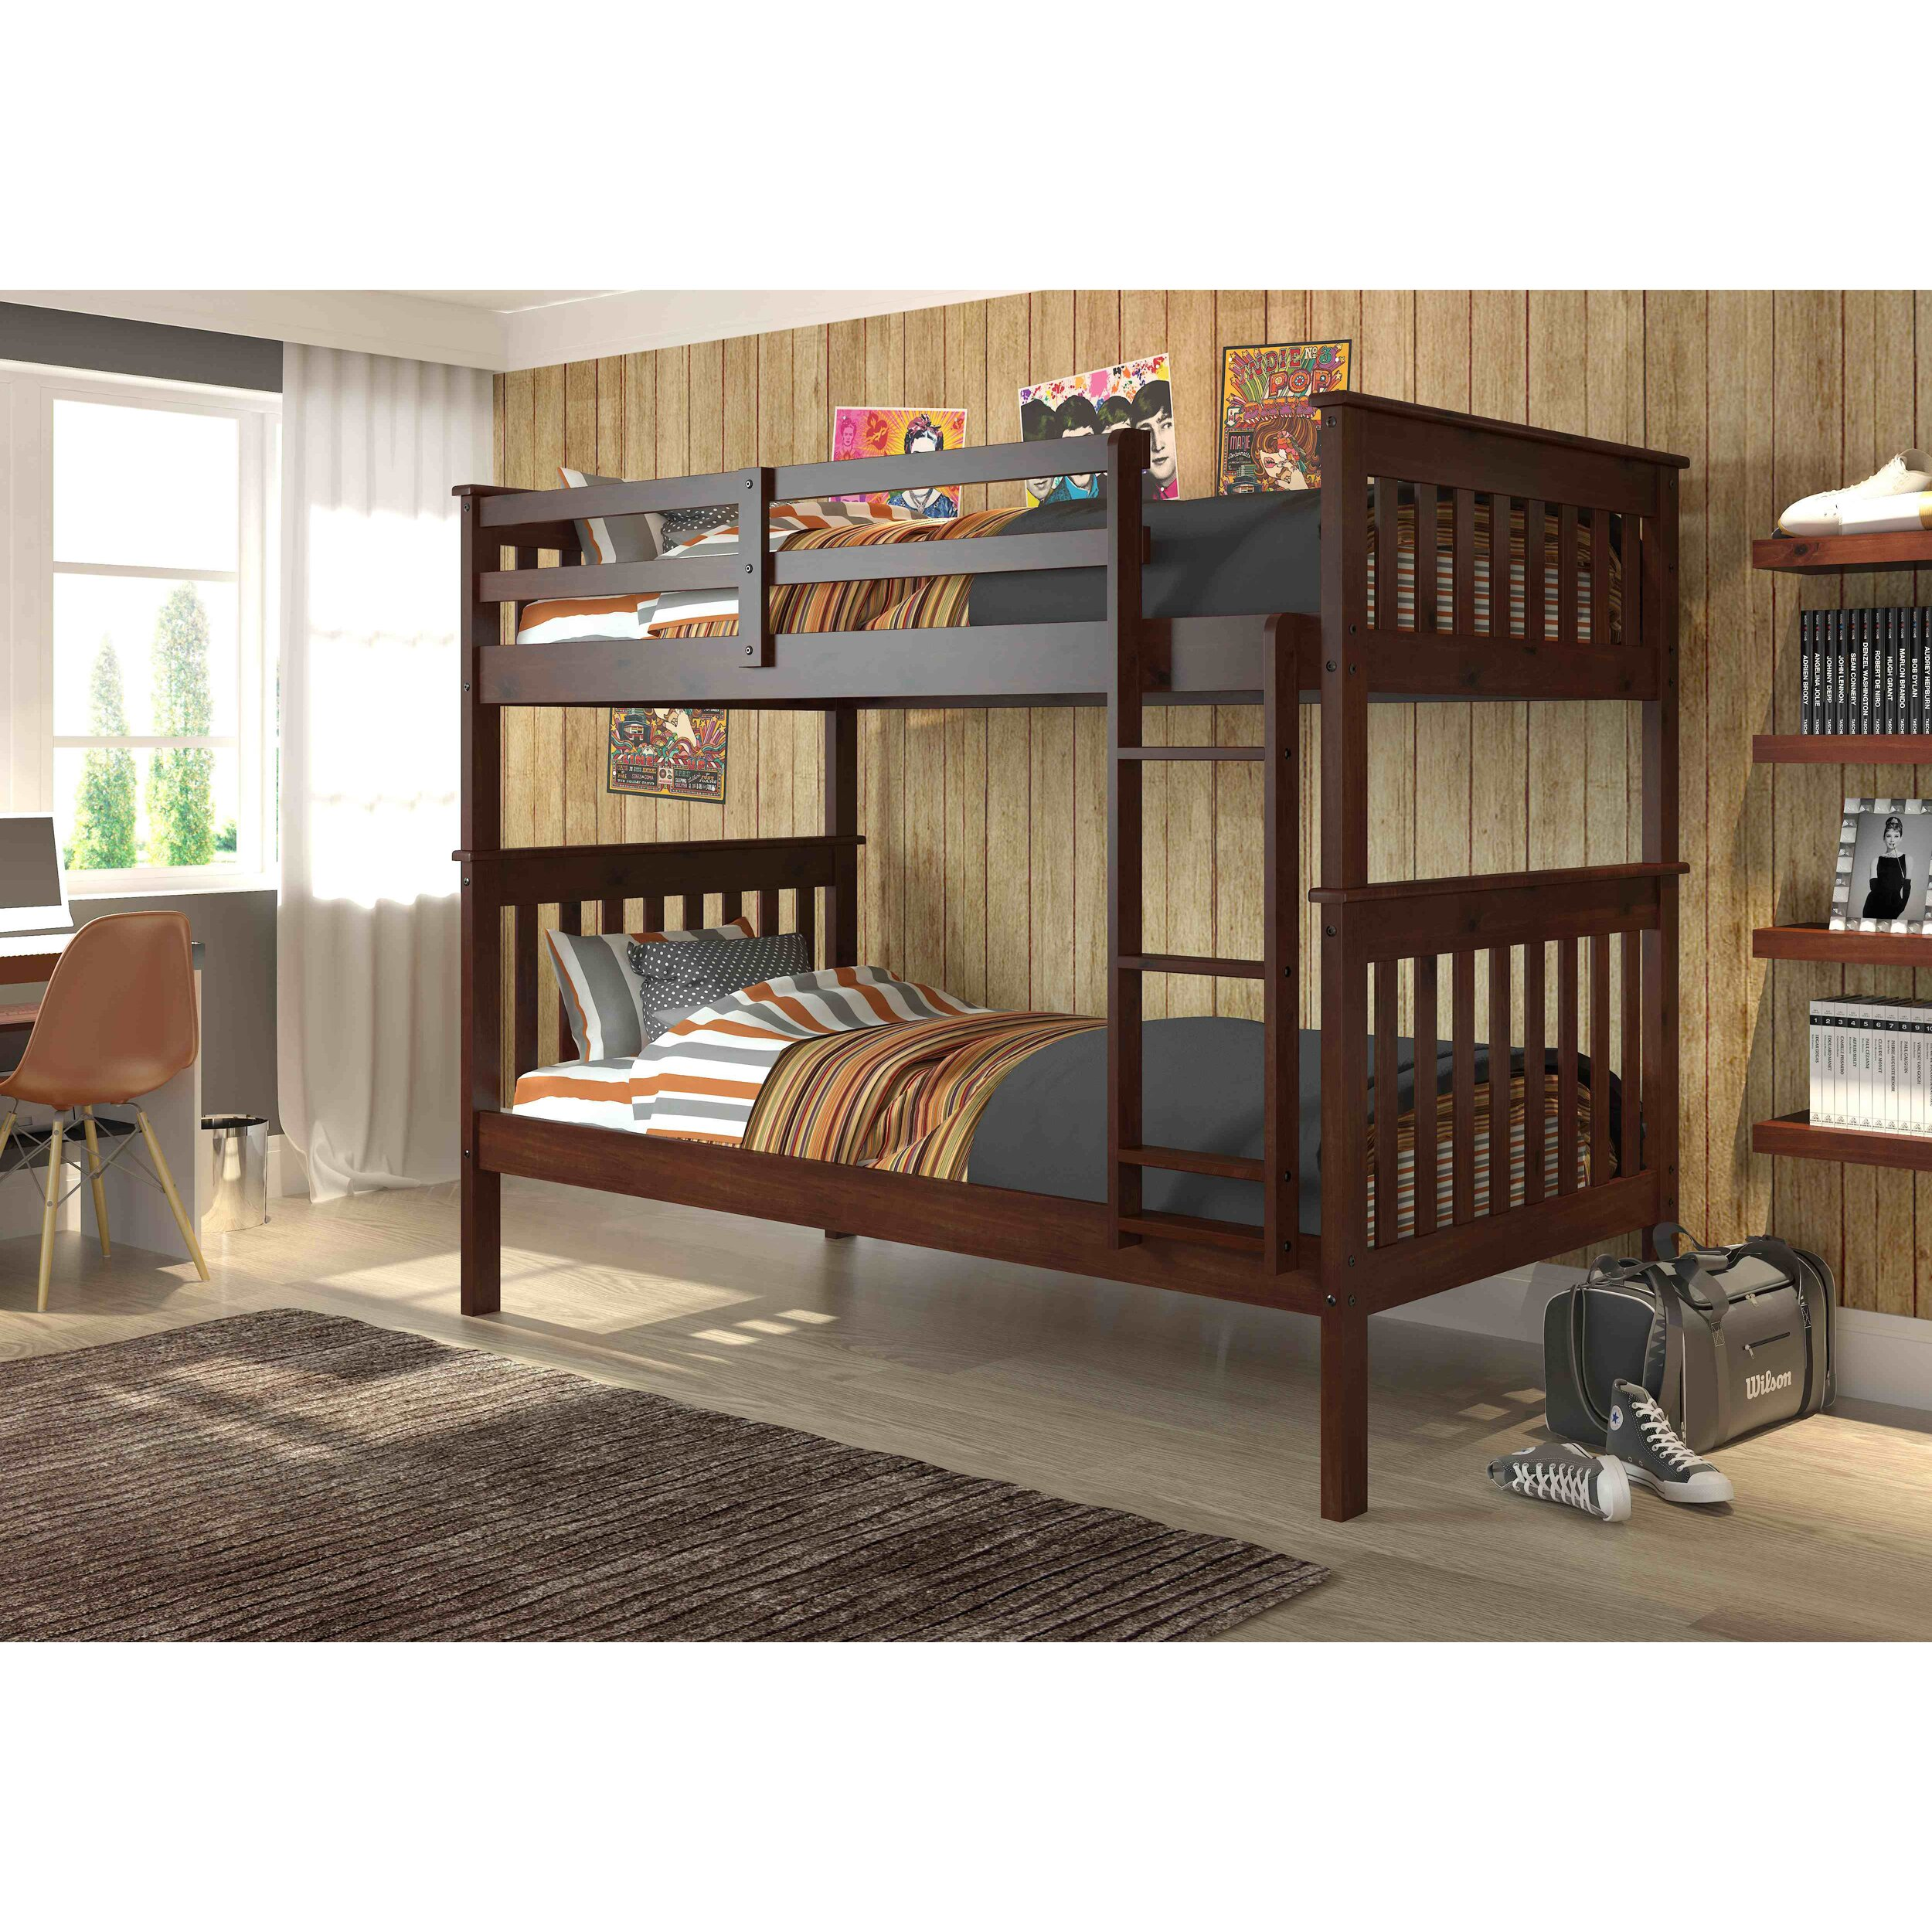 donco kids donco twin bunk bed reviews. Black Bedroom Furniture Sets. Home Design Ideas